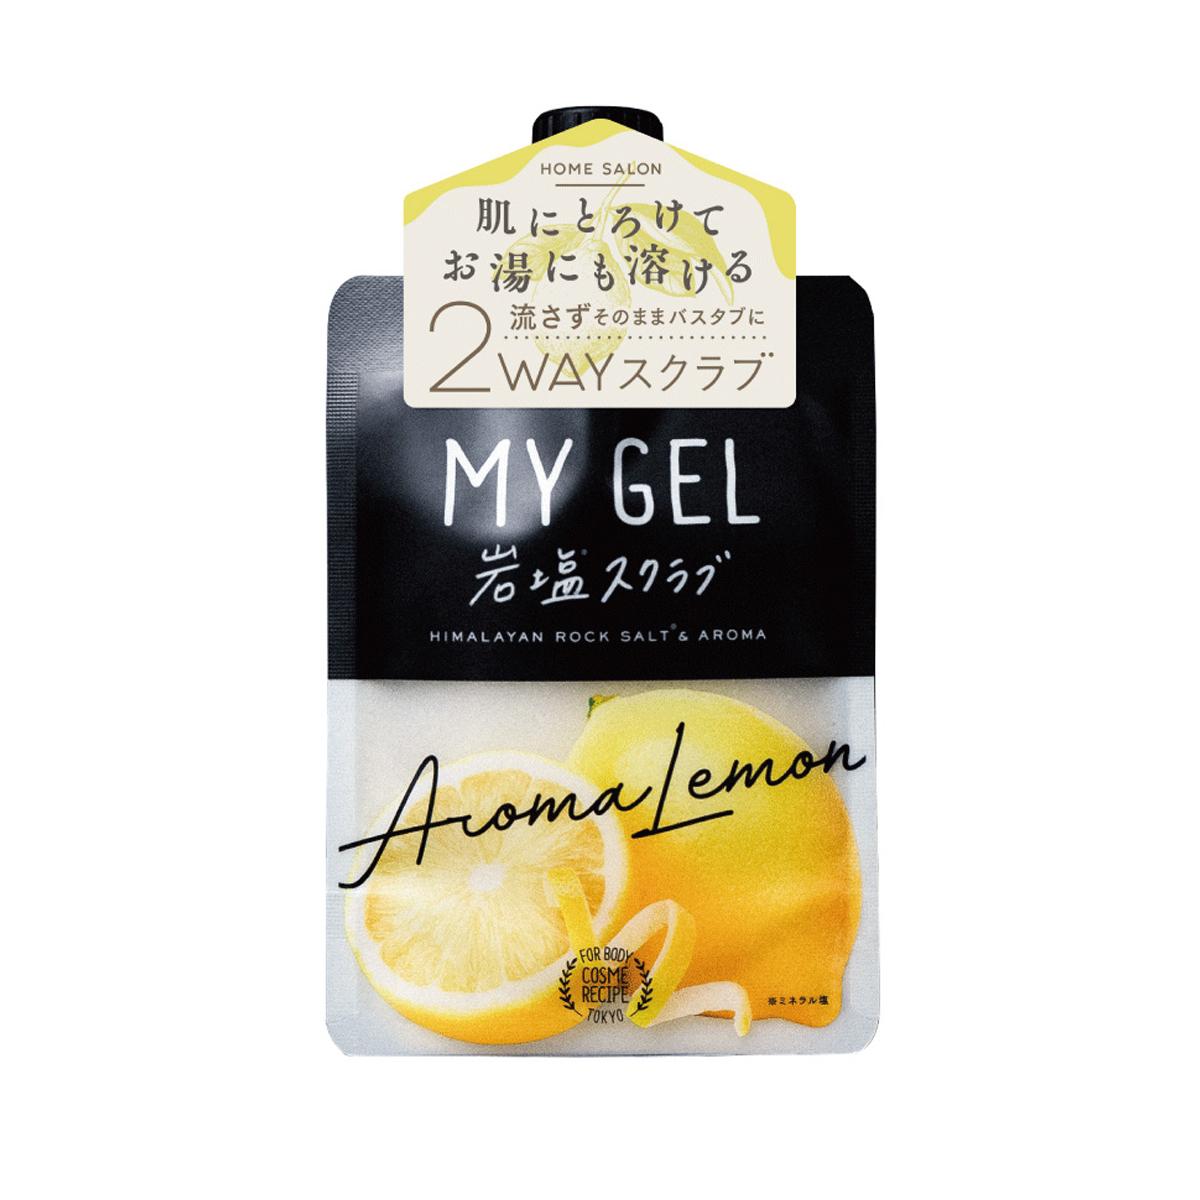 MY GEL 岩塩スクラブ #アロマレモン